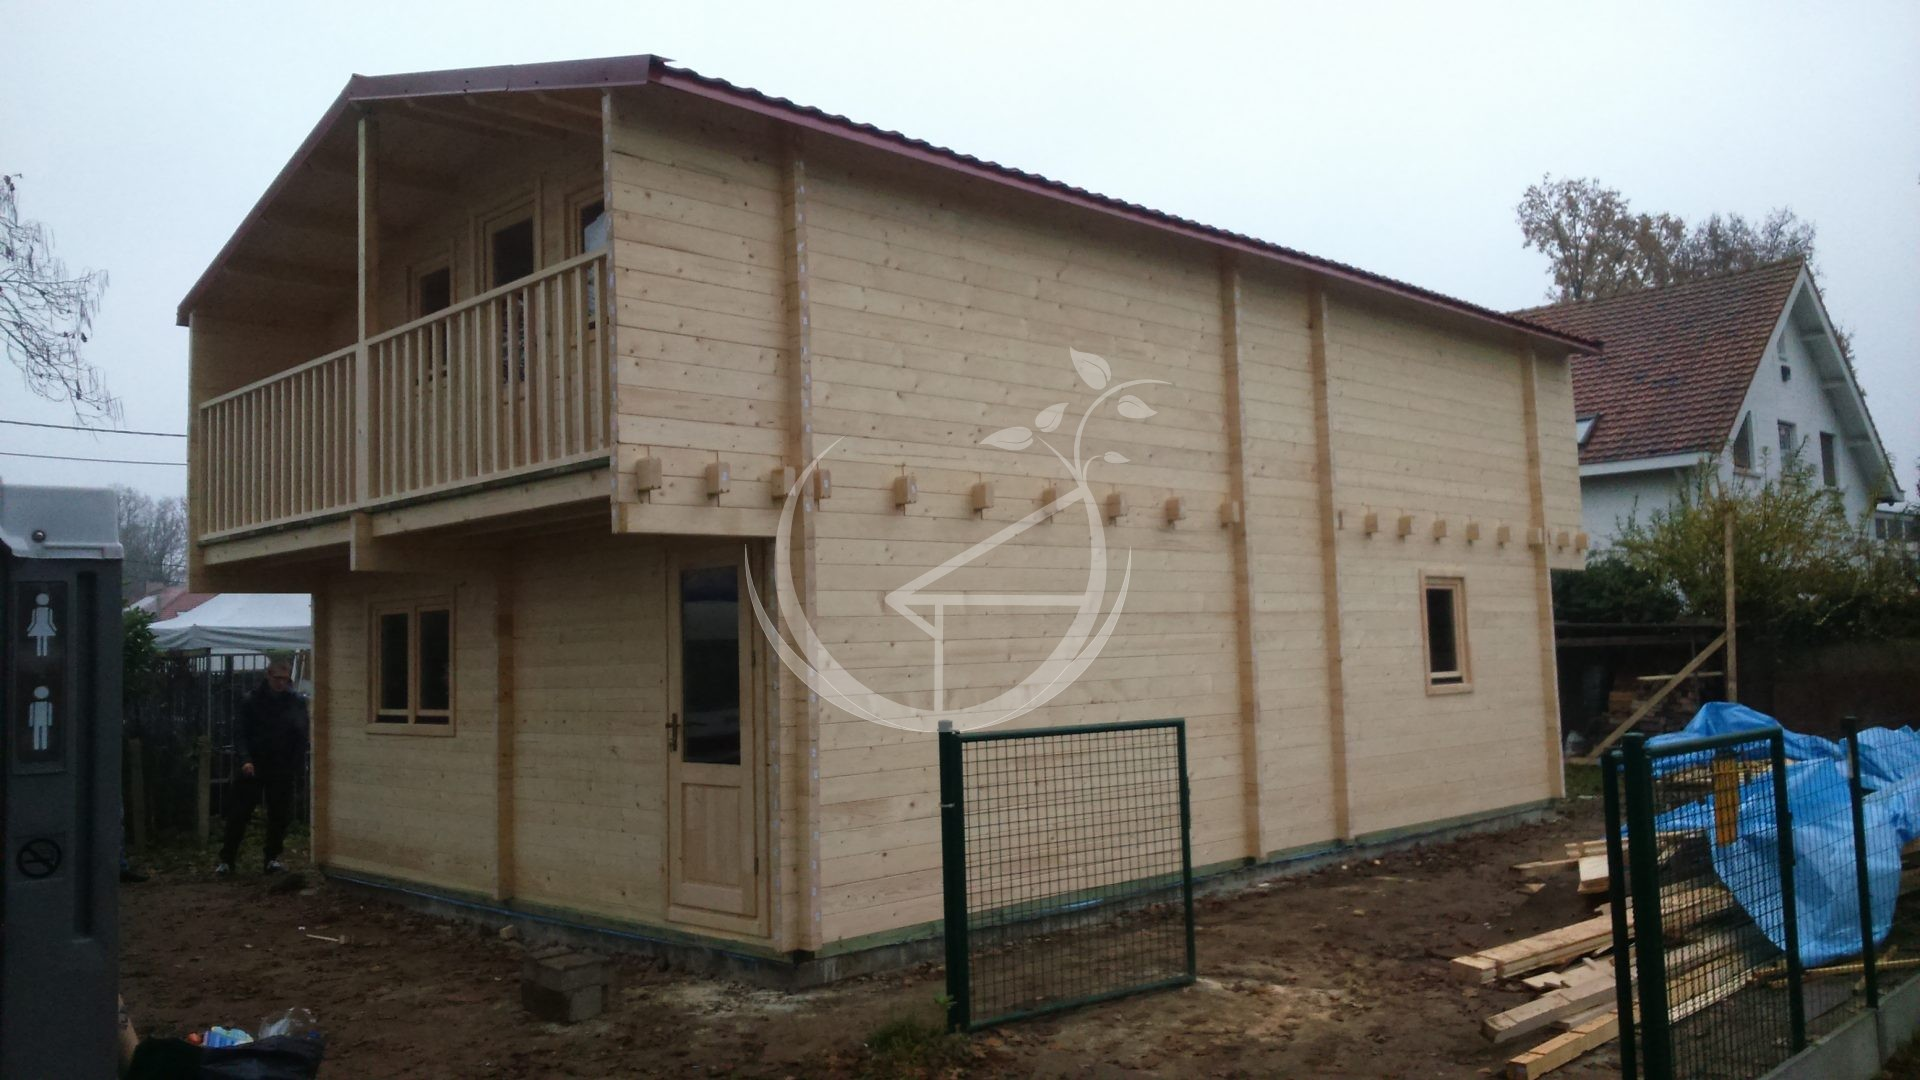 Two storey log cabin verona x log cabins ireland for Two storey log cabin